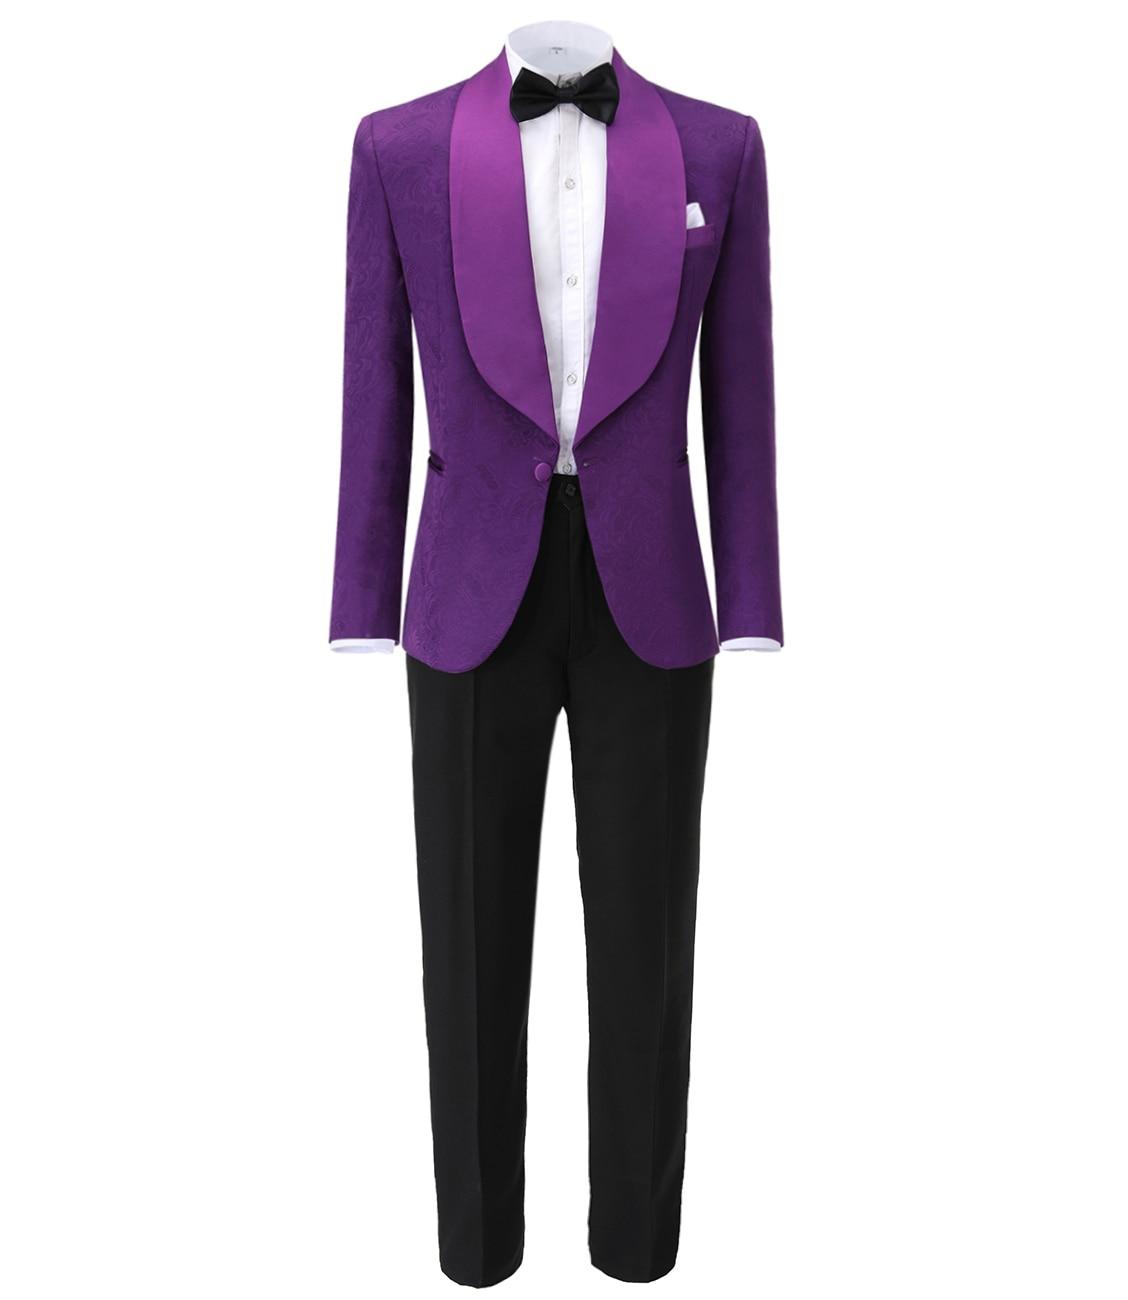 Фото - Mens Wedding Suits 2019 Italian Design Custom Made Black Smoking Tuxedo Jacket Notch Lapel Groomsmen Jacquard(Blazer+vest+Pants) italian interior design